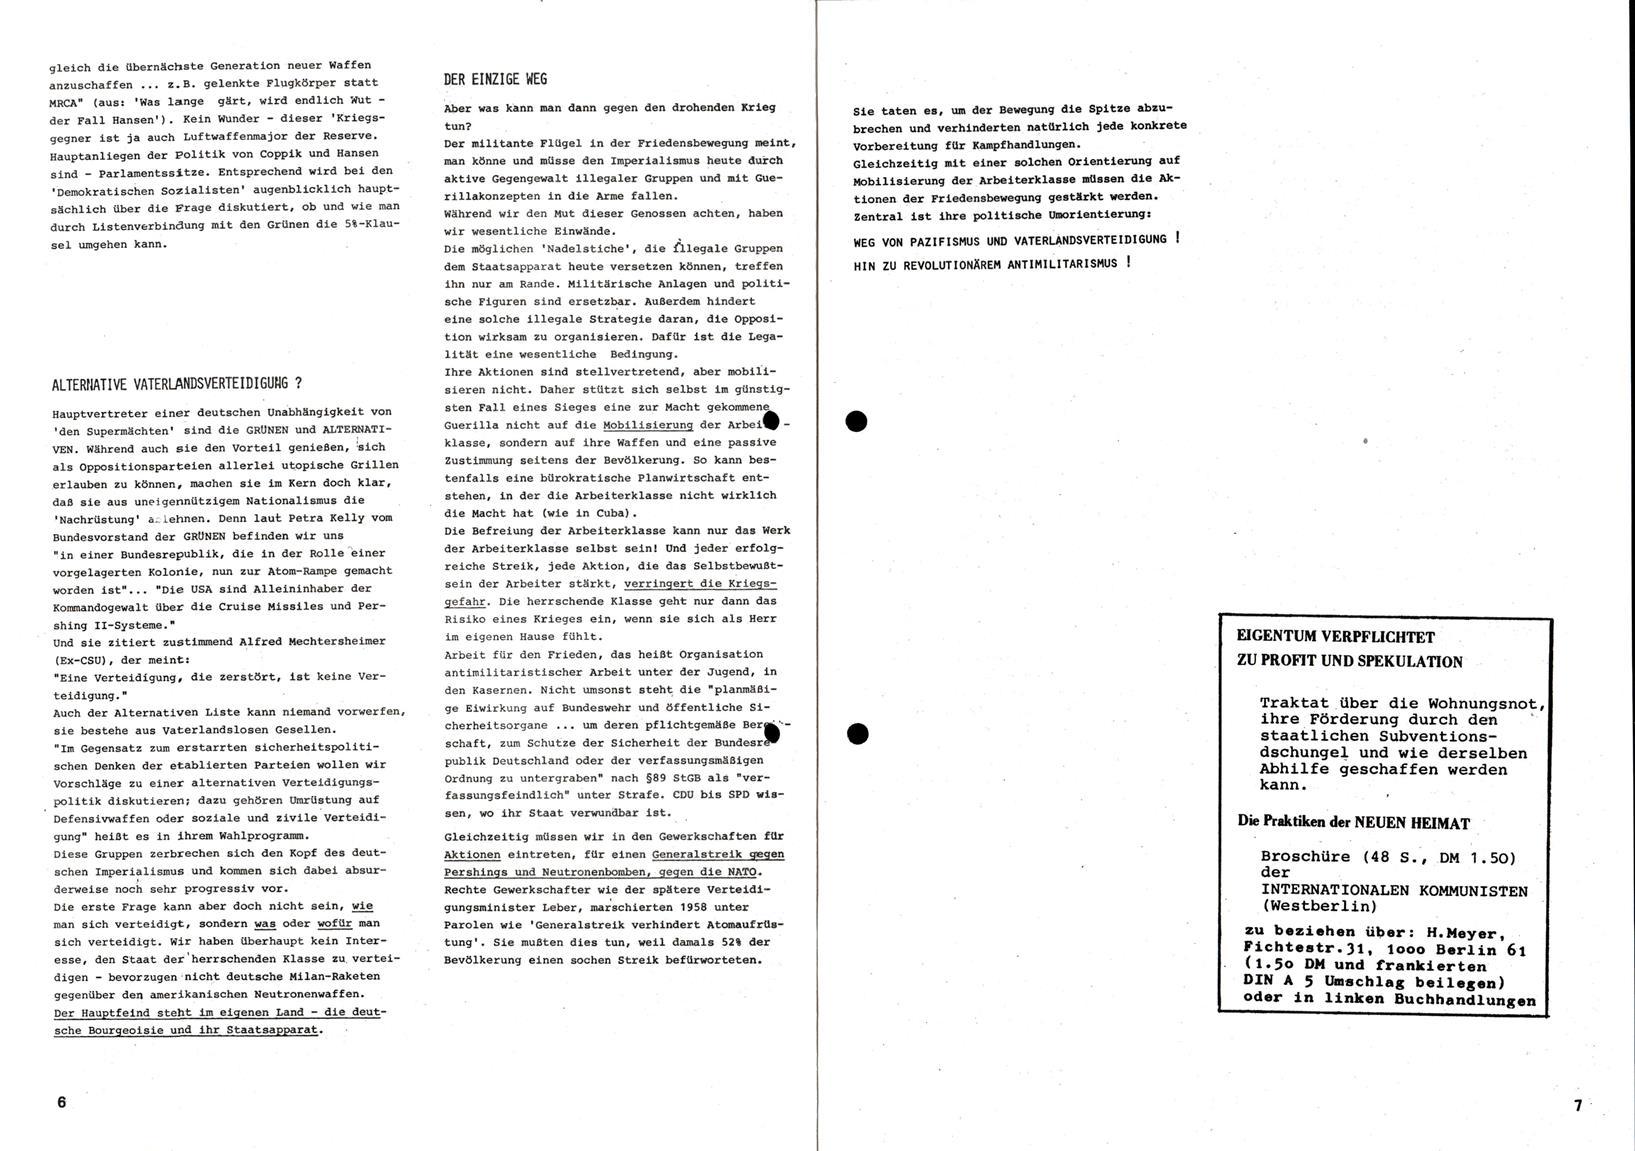 BER_IKW_Oktober_19820400_003_004